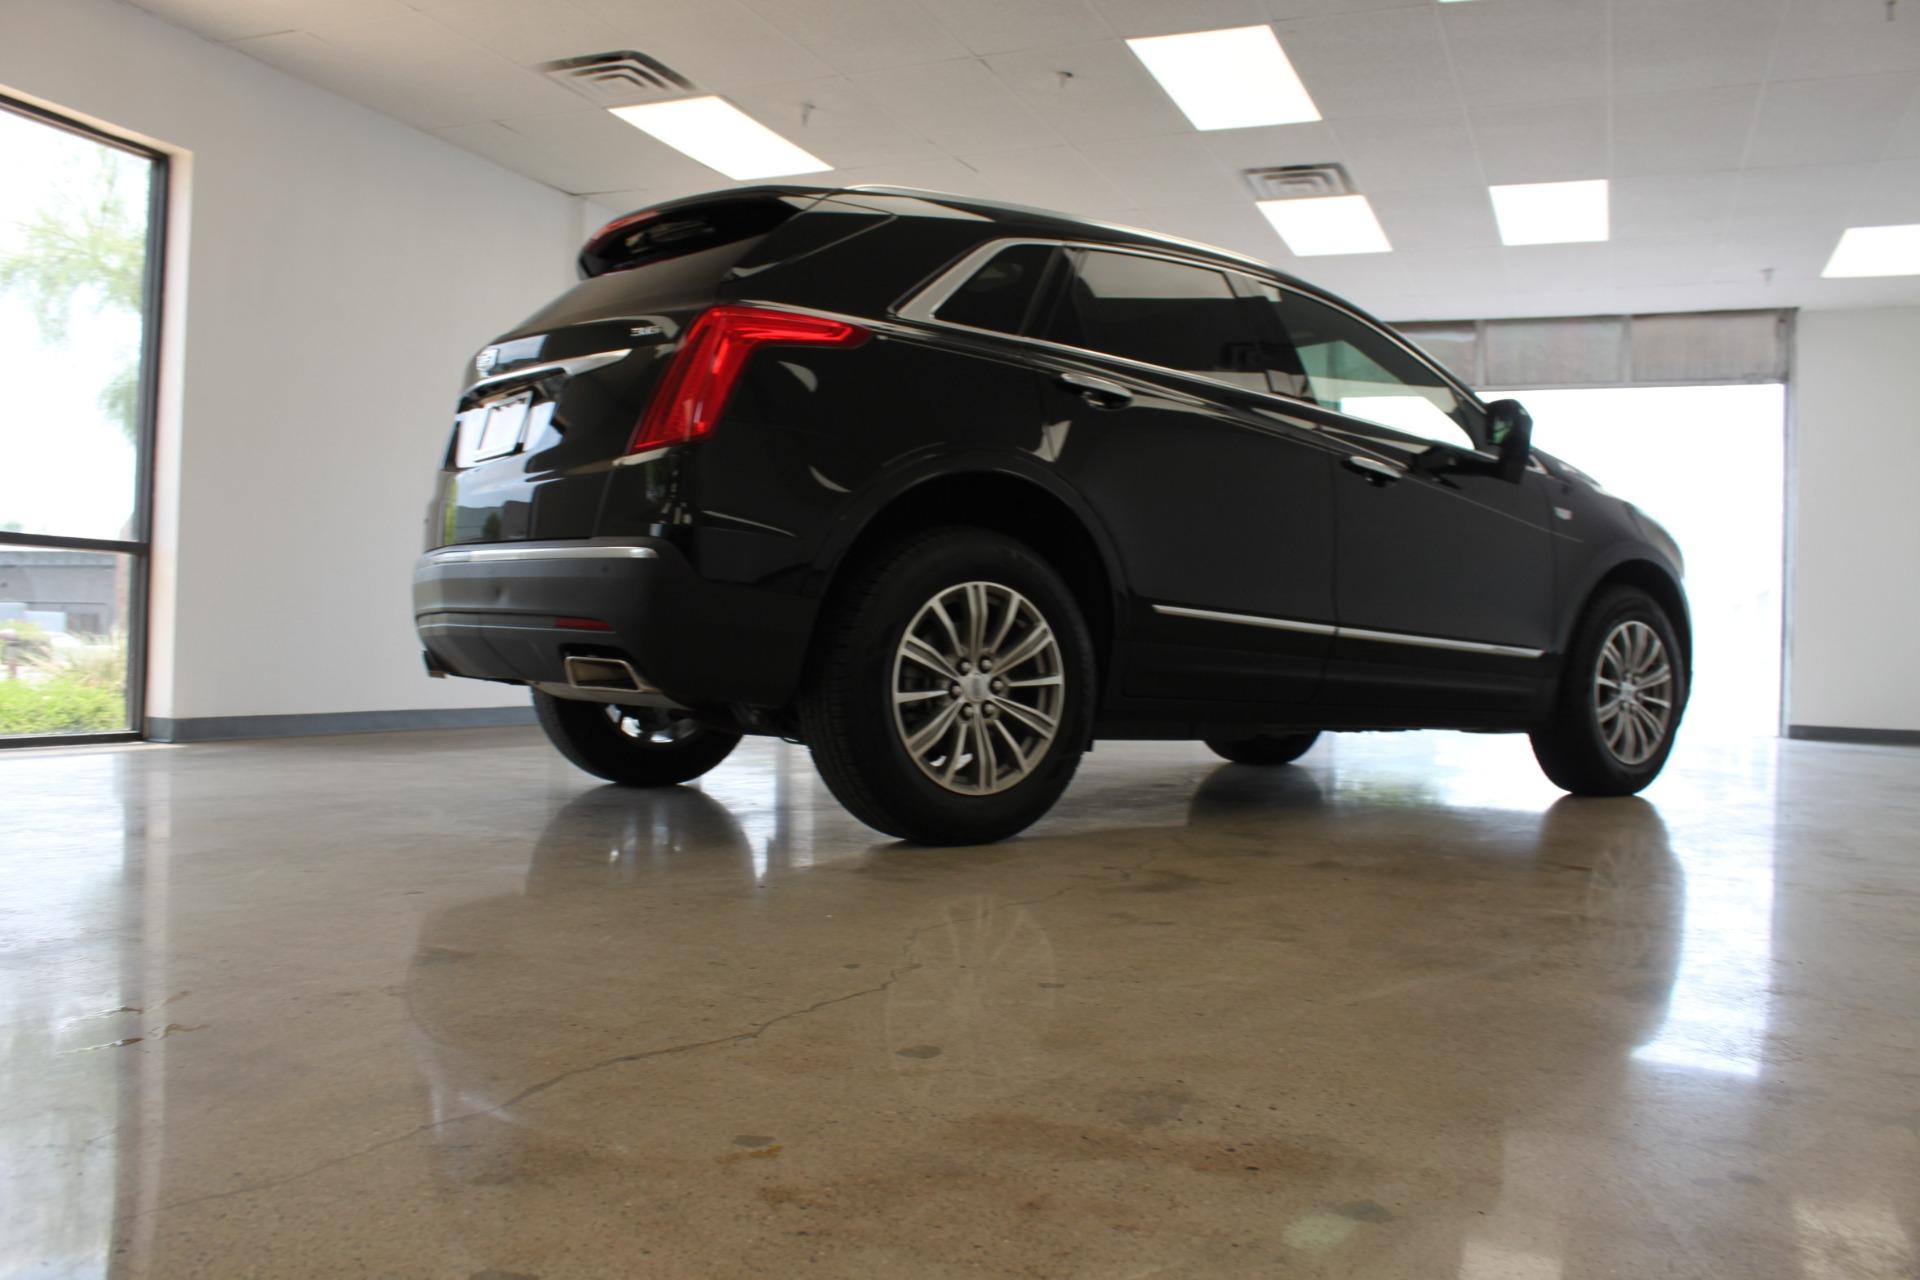 Used-2017-Cadillac-XT5-Luxury-All-Wheel-Drive-Luxury-AWD-Jaguar